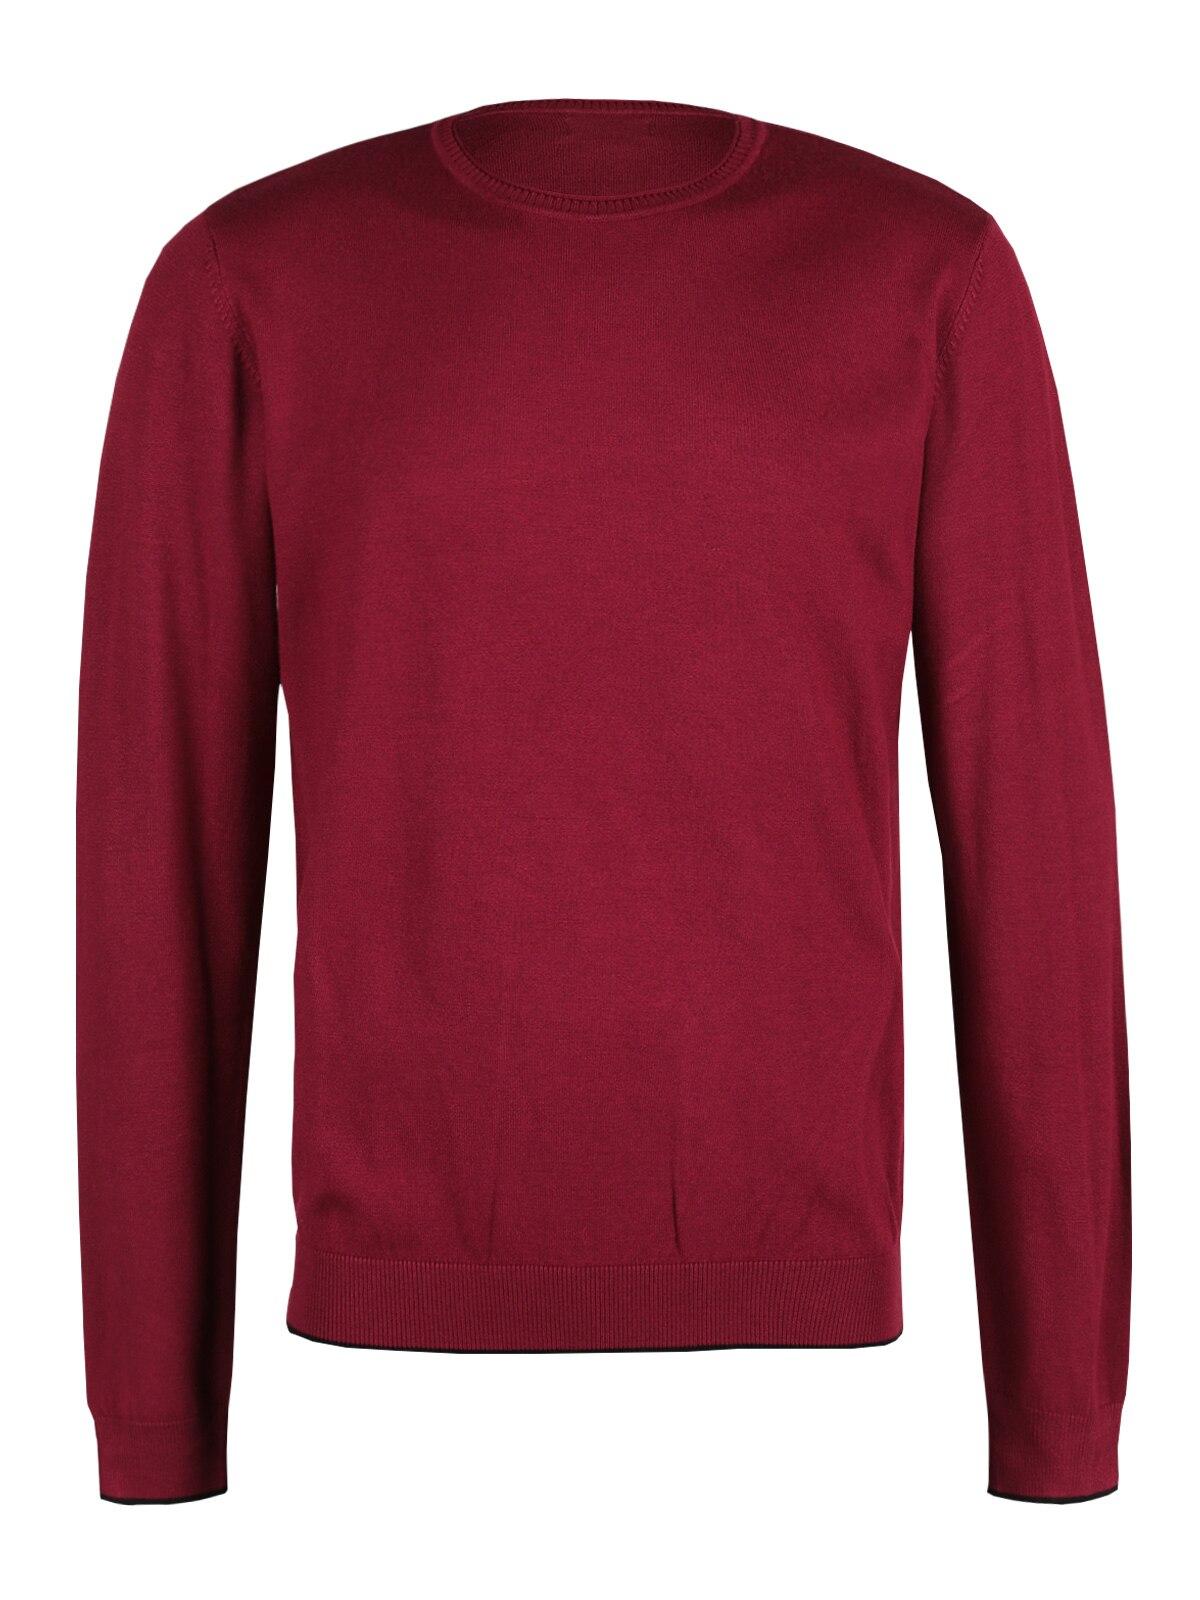 Round Neck Sweater Basic